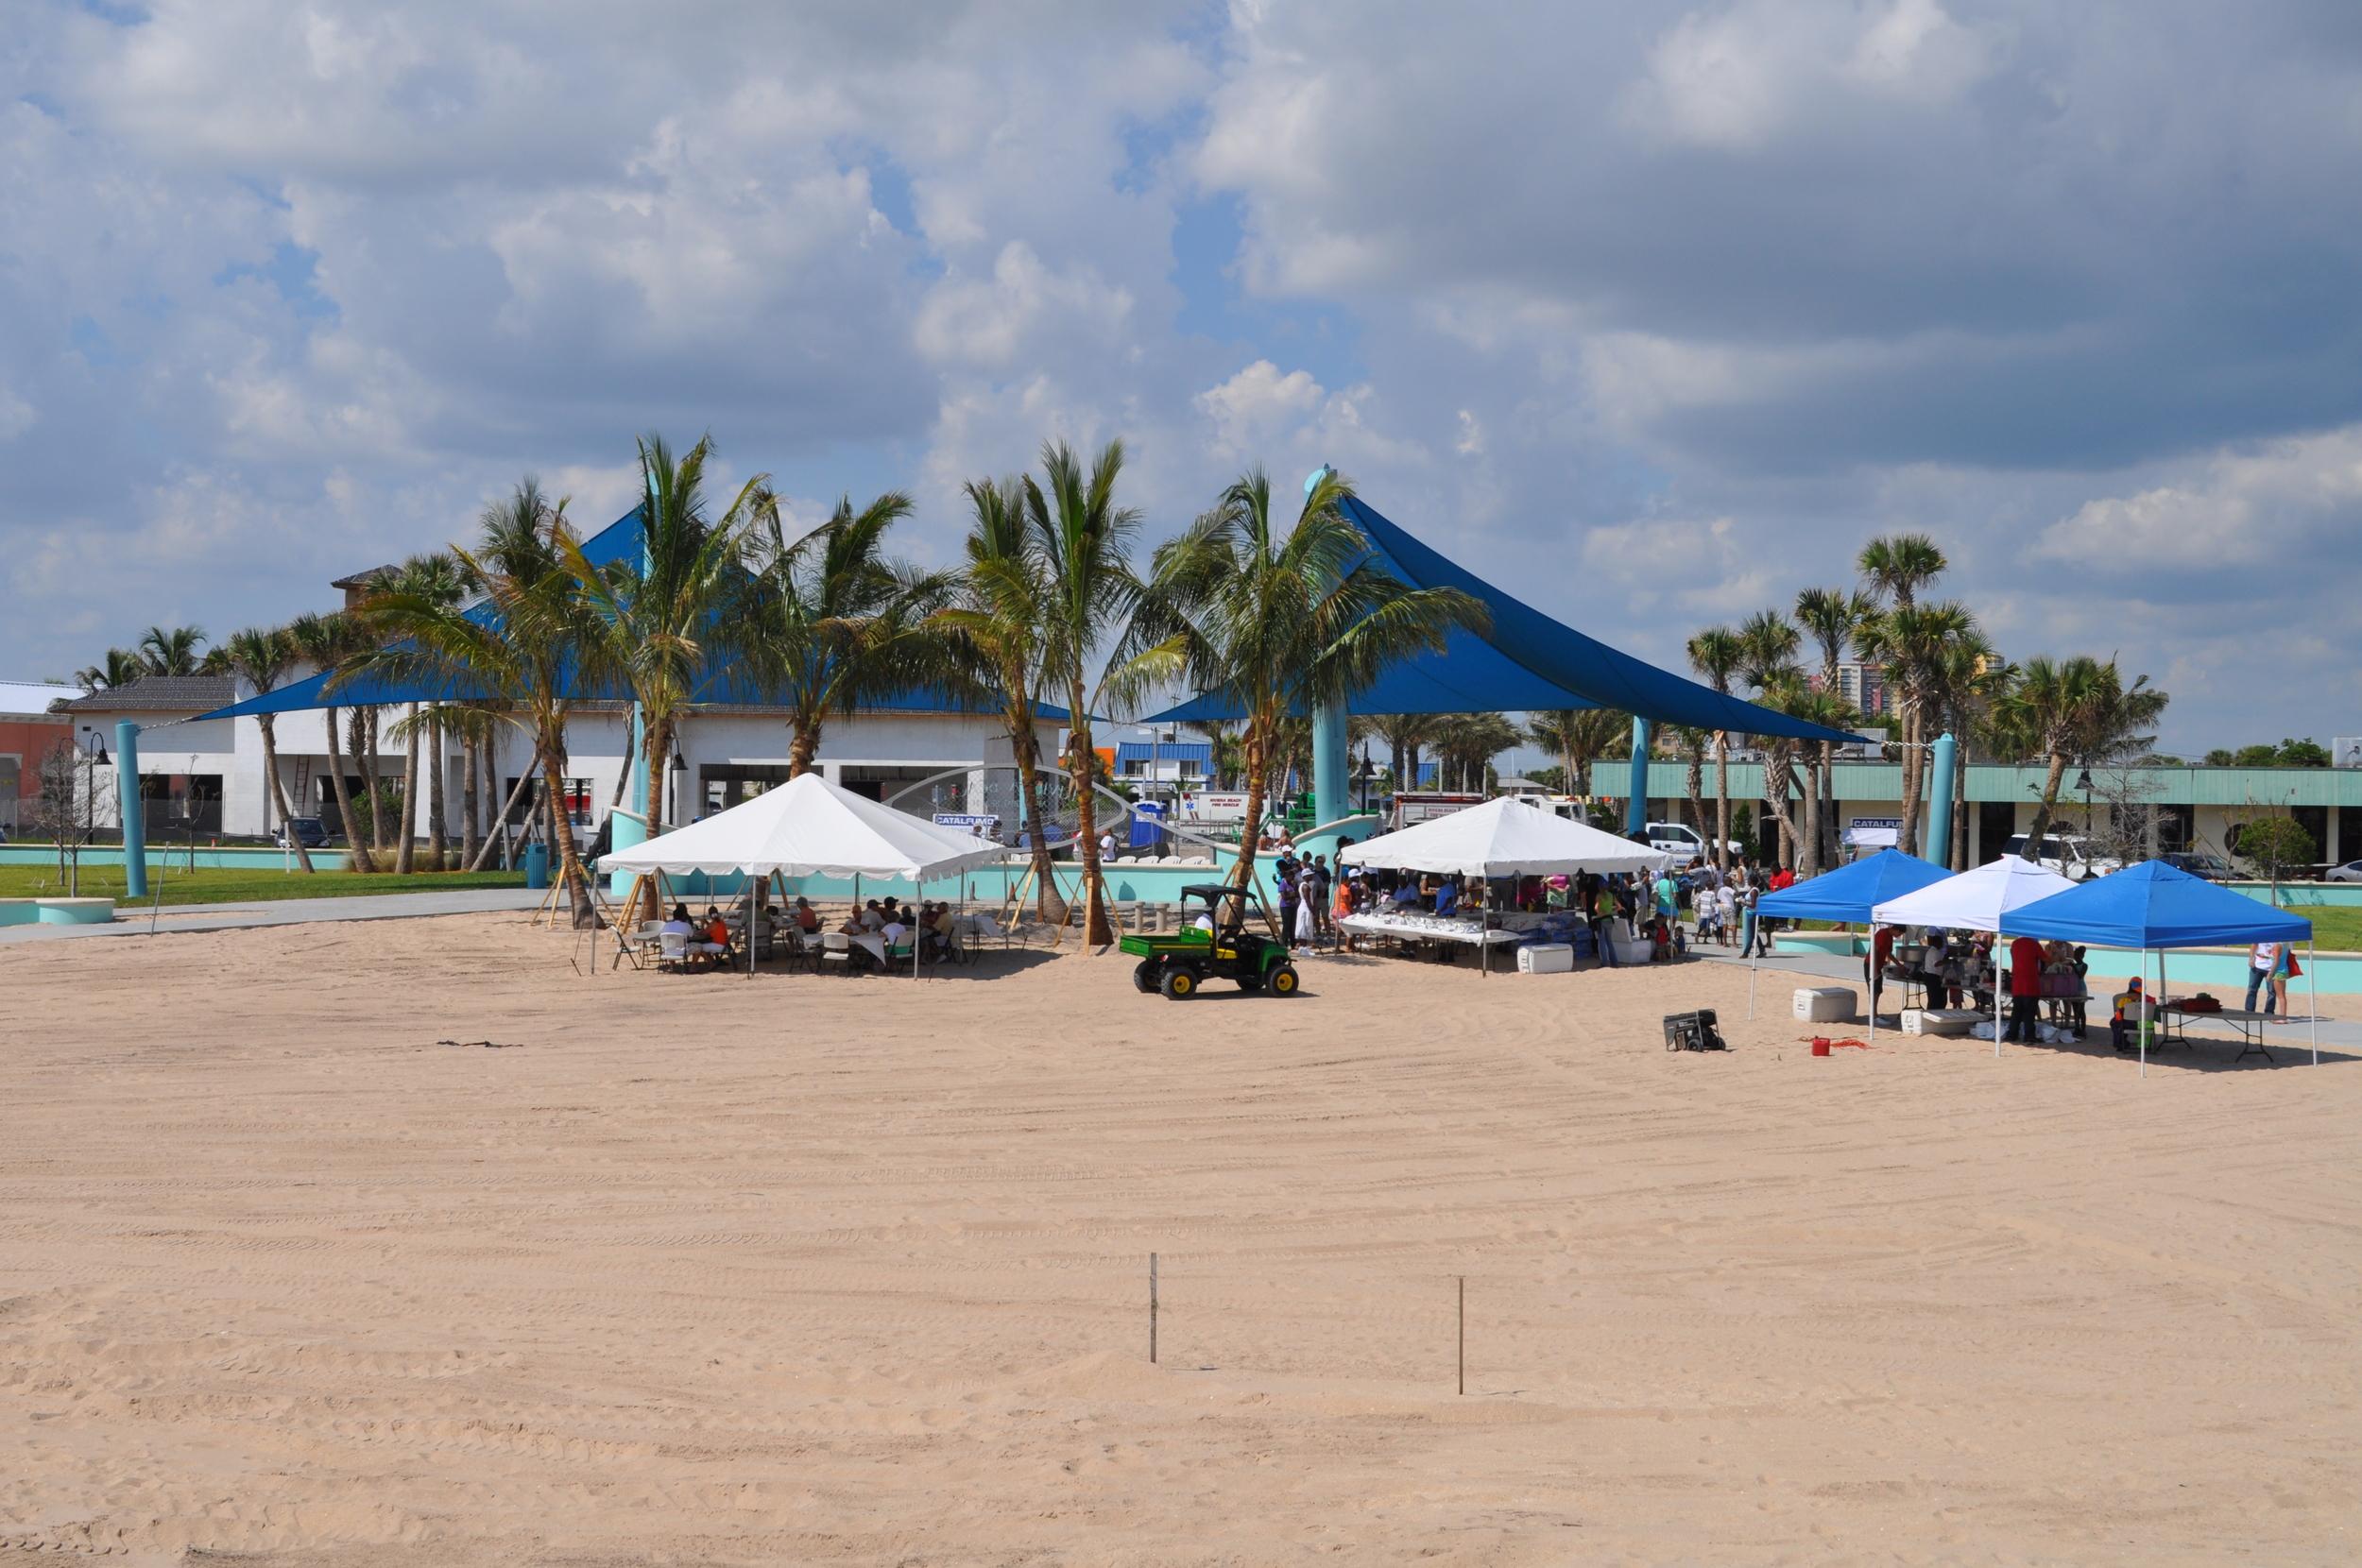 City of Riviera Beach Municipal Beach Park Ocean Mall Beach events.jpg